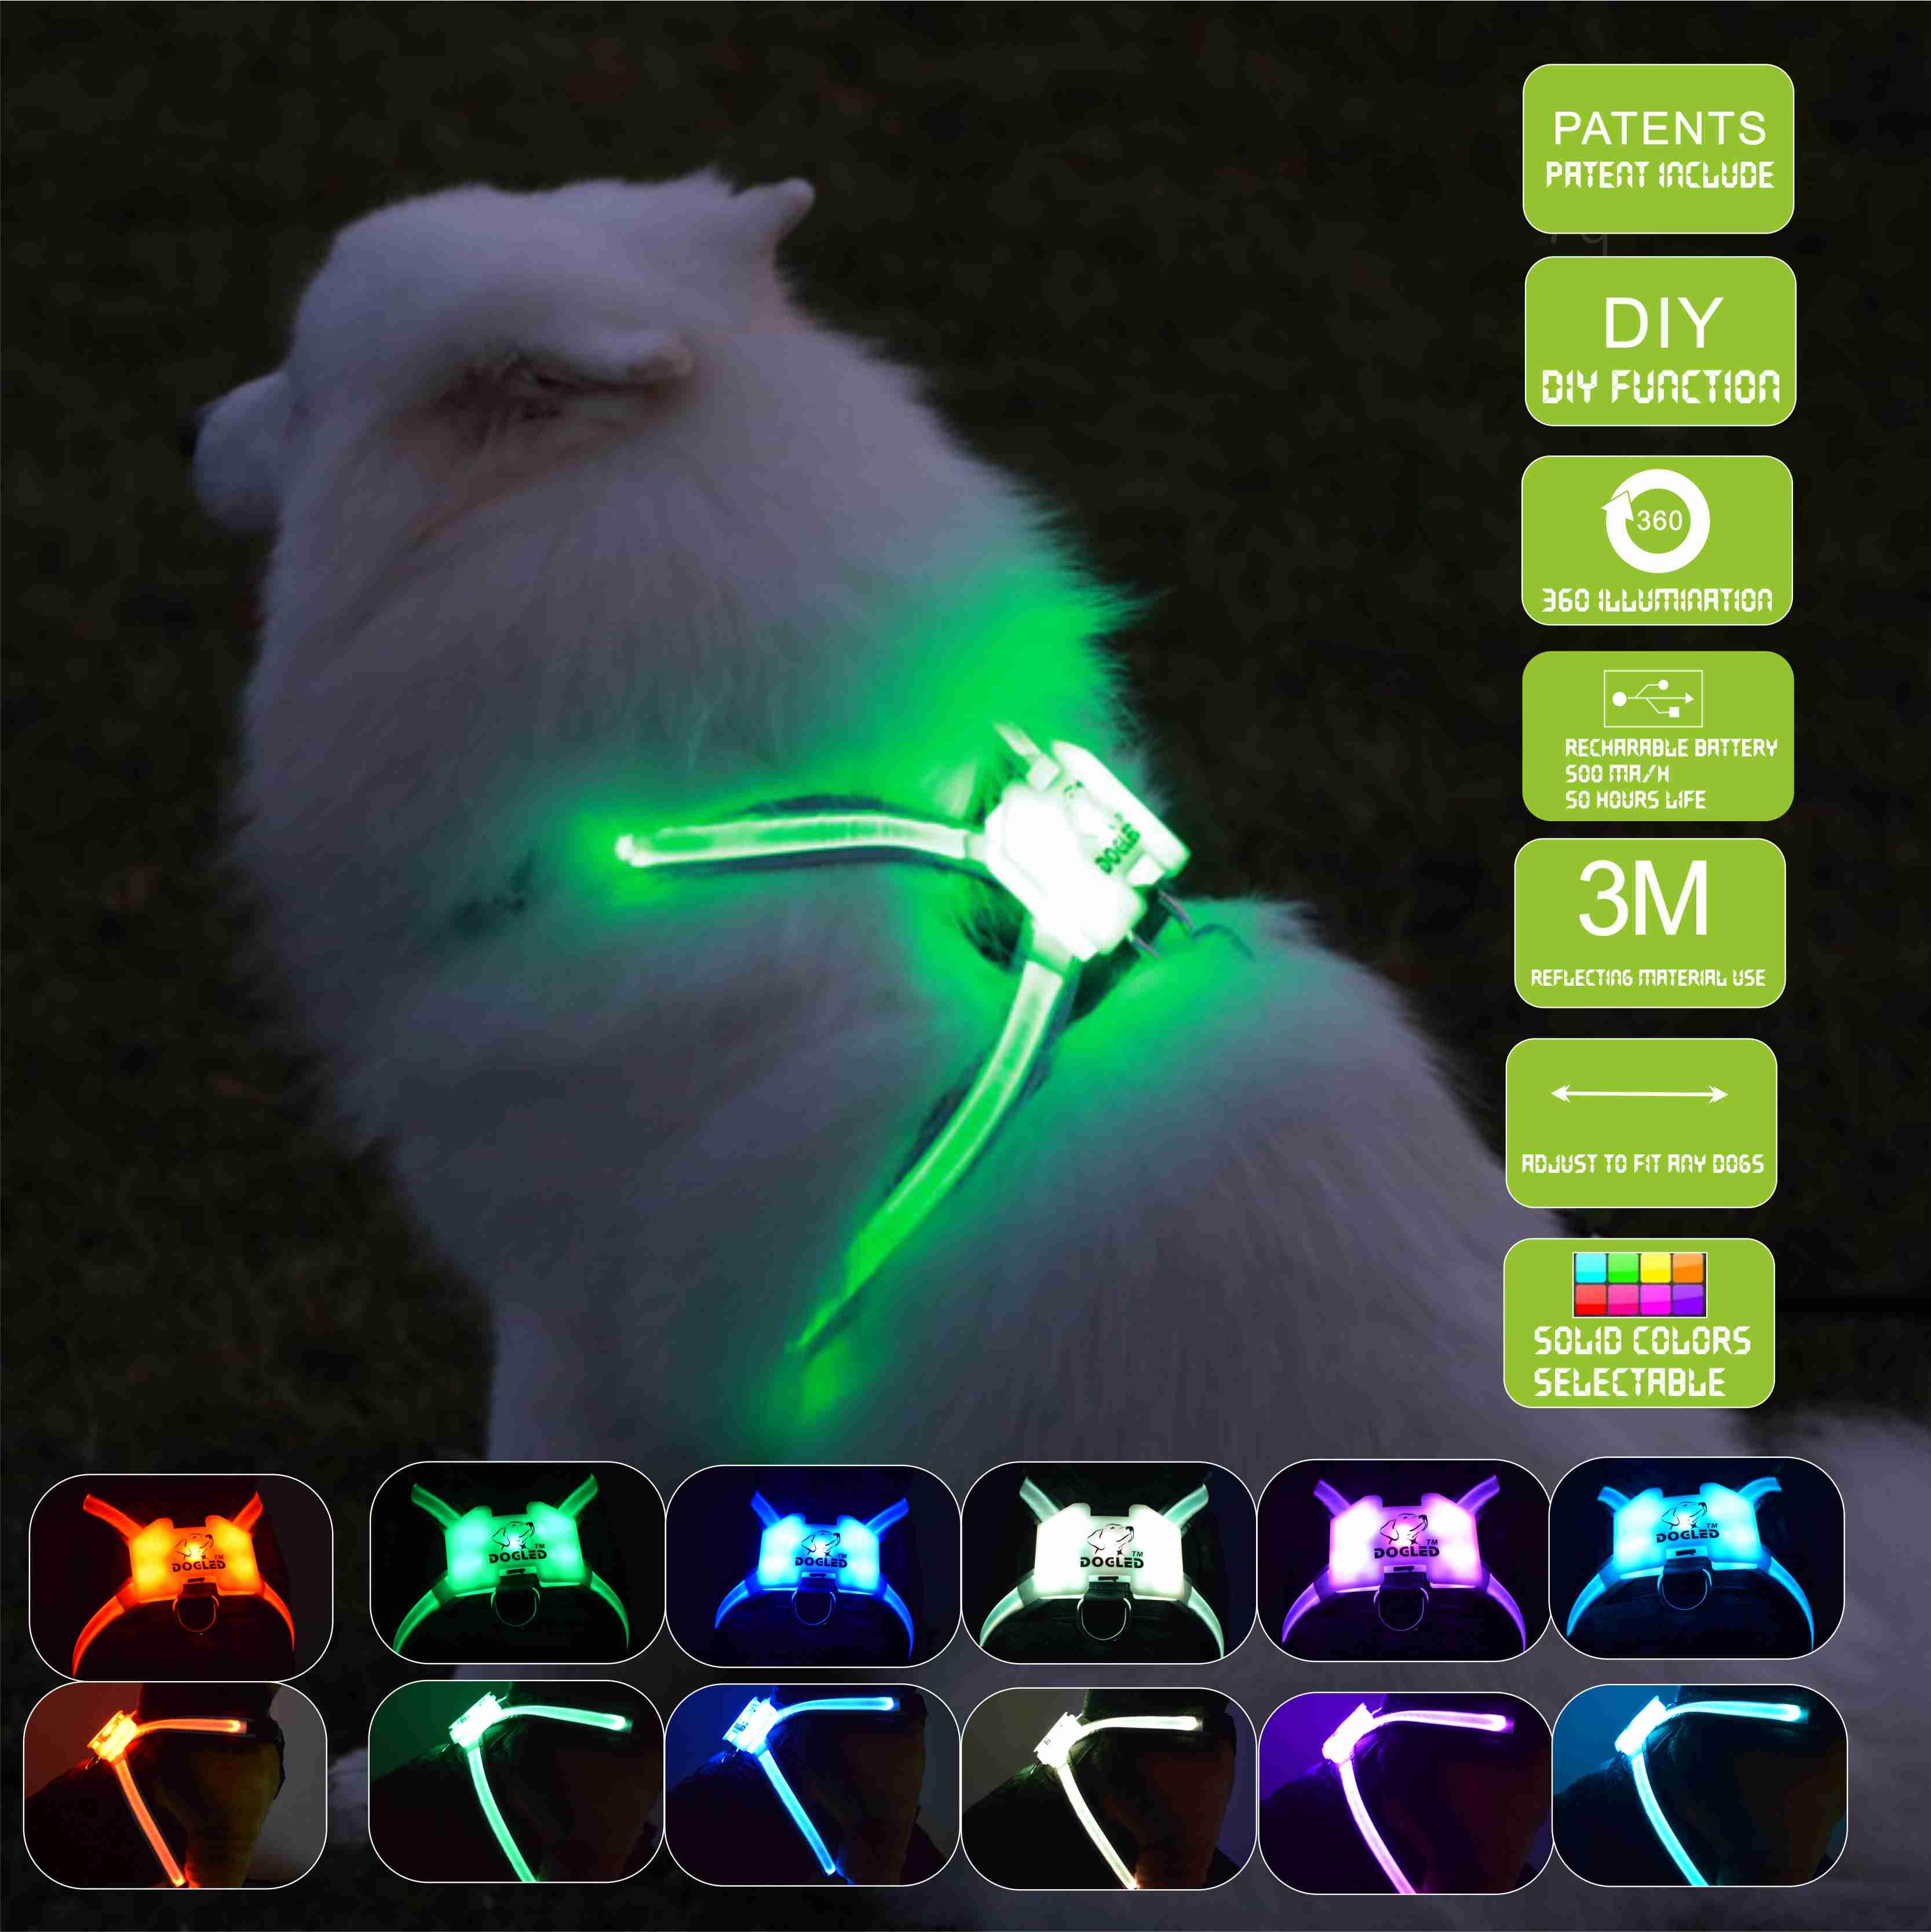 Dogled تسخير الحيوانات الأليفة المنتجات ل كبيرة 7 في 1 اللون الكلب تسخير متوهجة USB Led طوق جرو الرصاص الحيوانات الأليفة سترة الكلب يؤدي